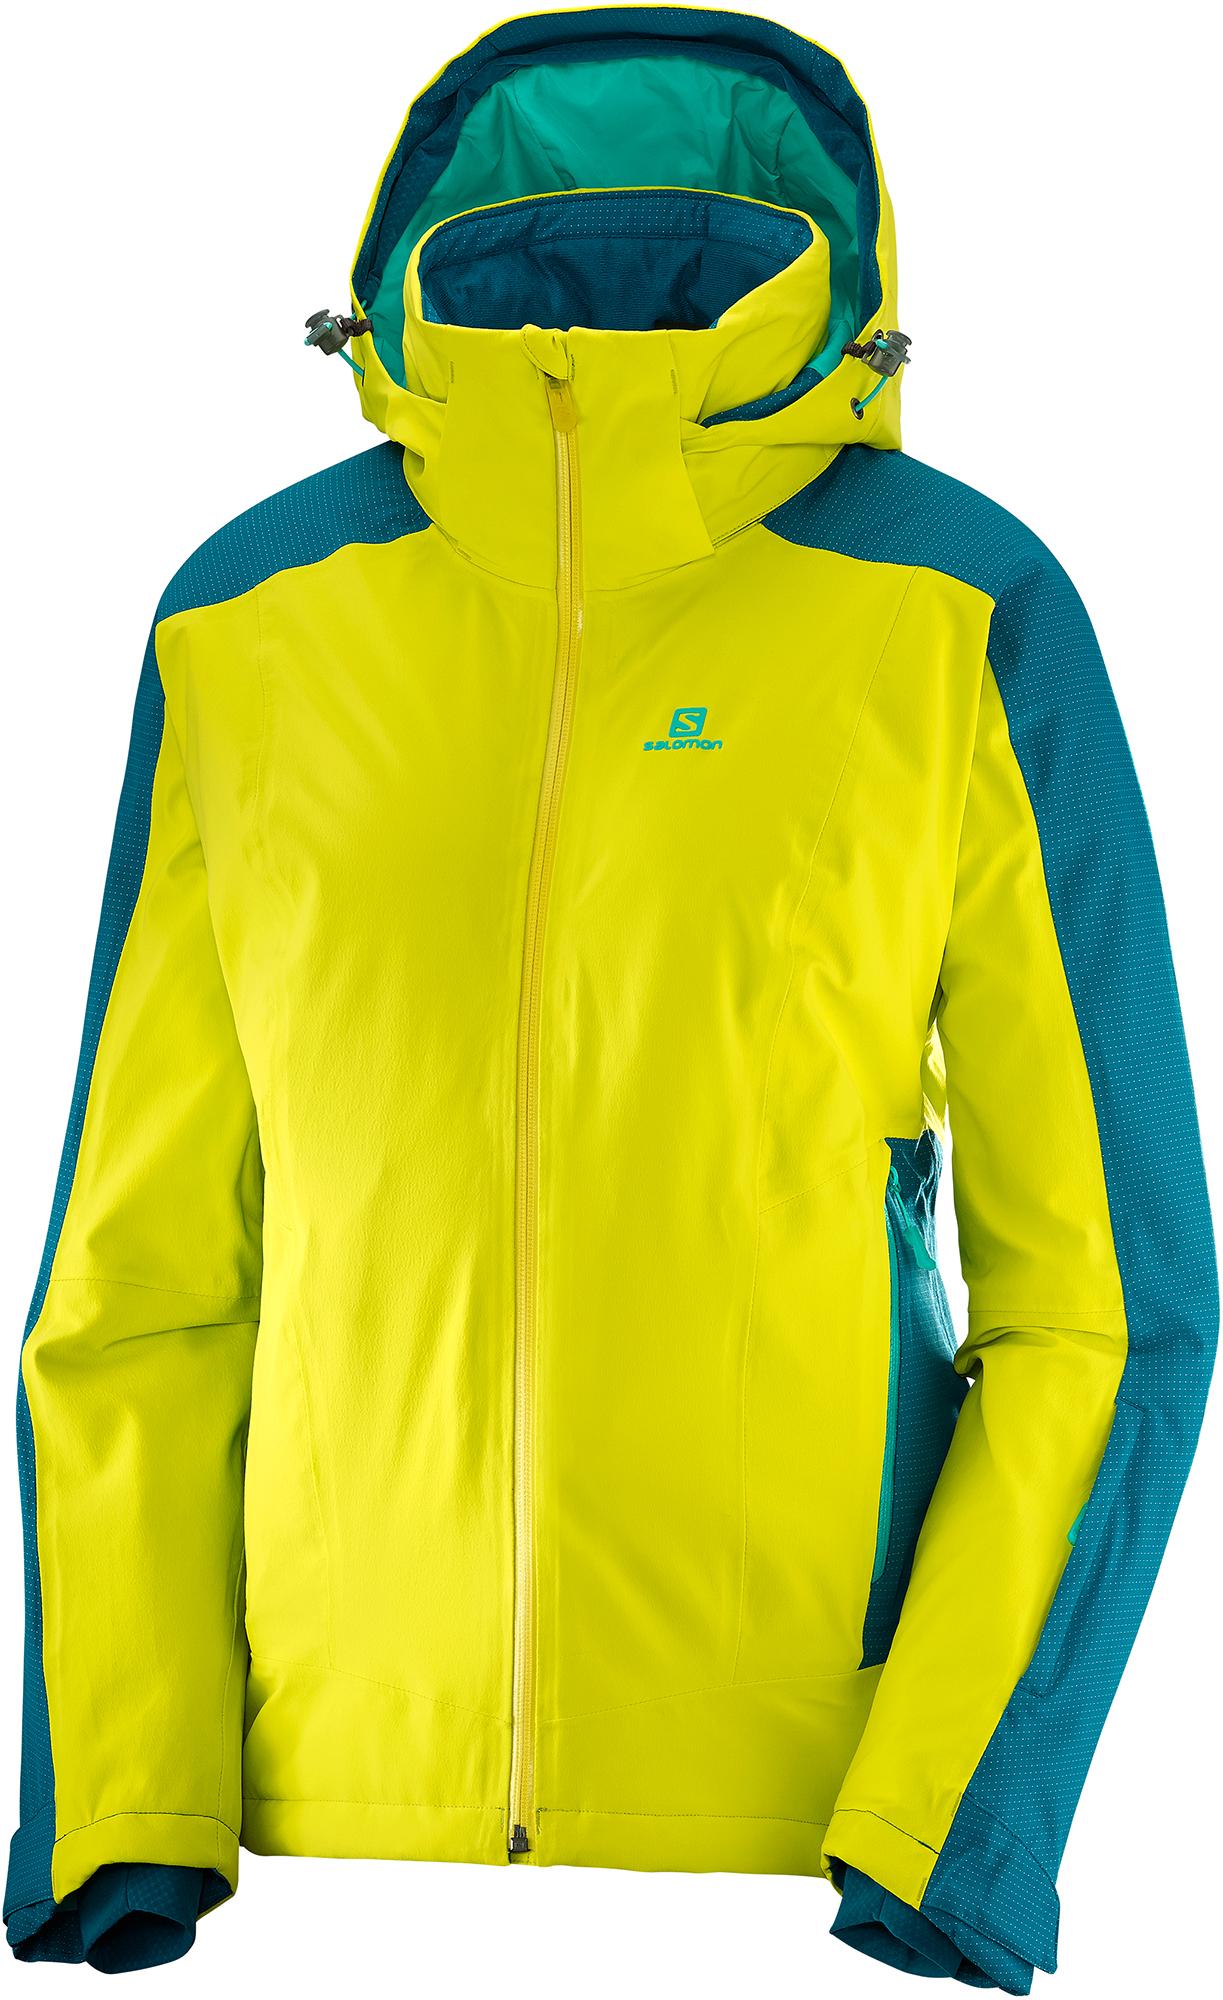 Salomon Куртка утепленная женская Salomon Brilliant, размер 54